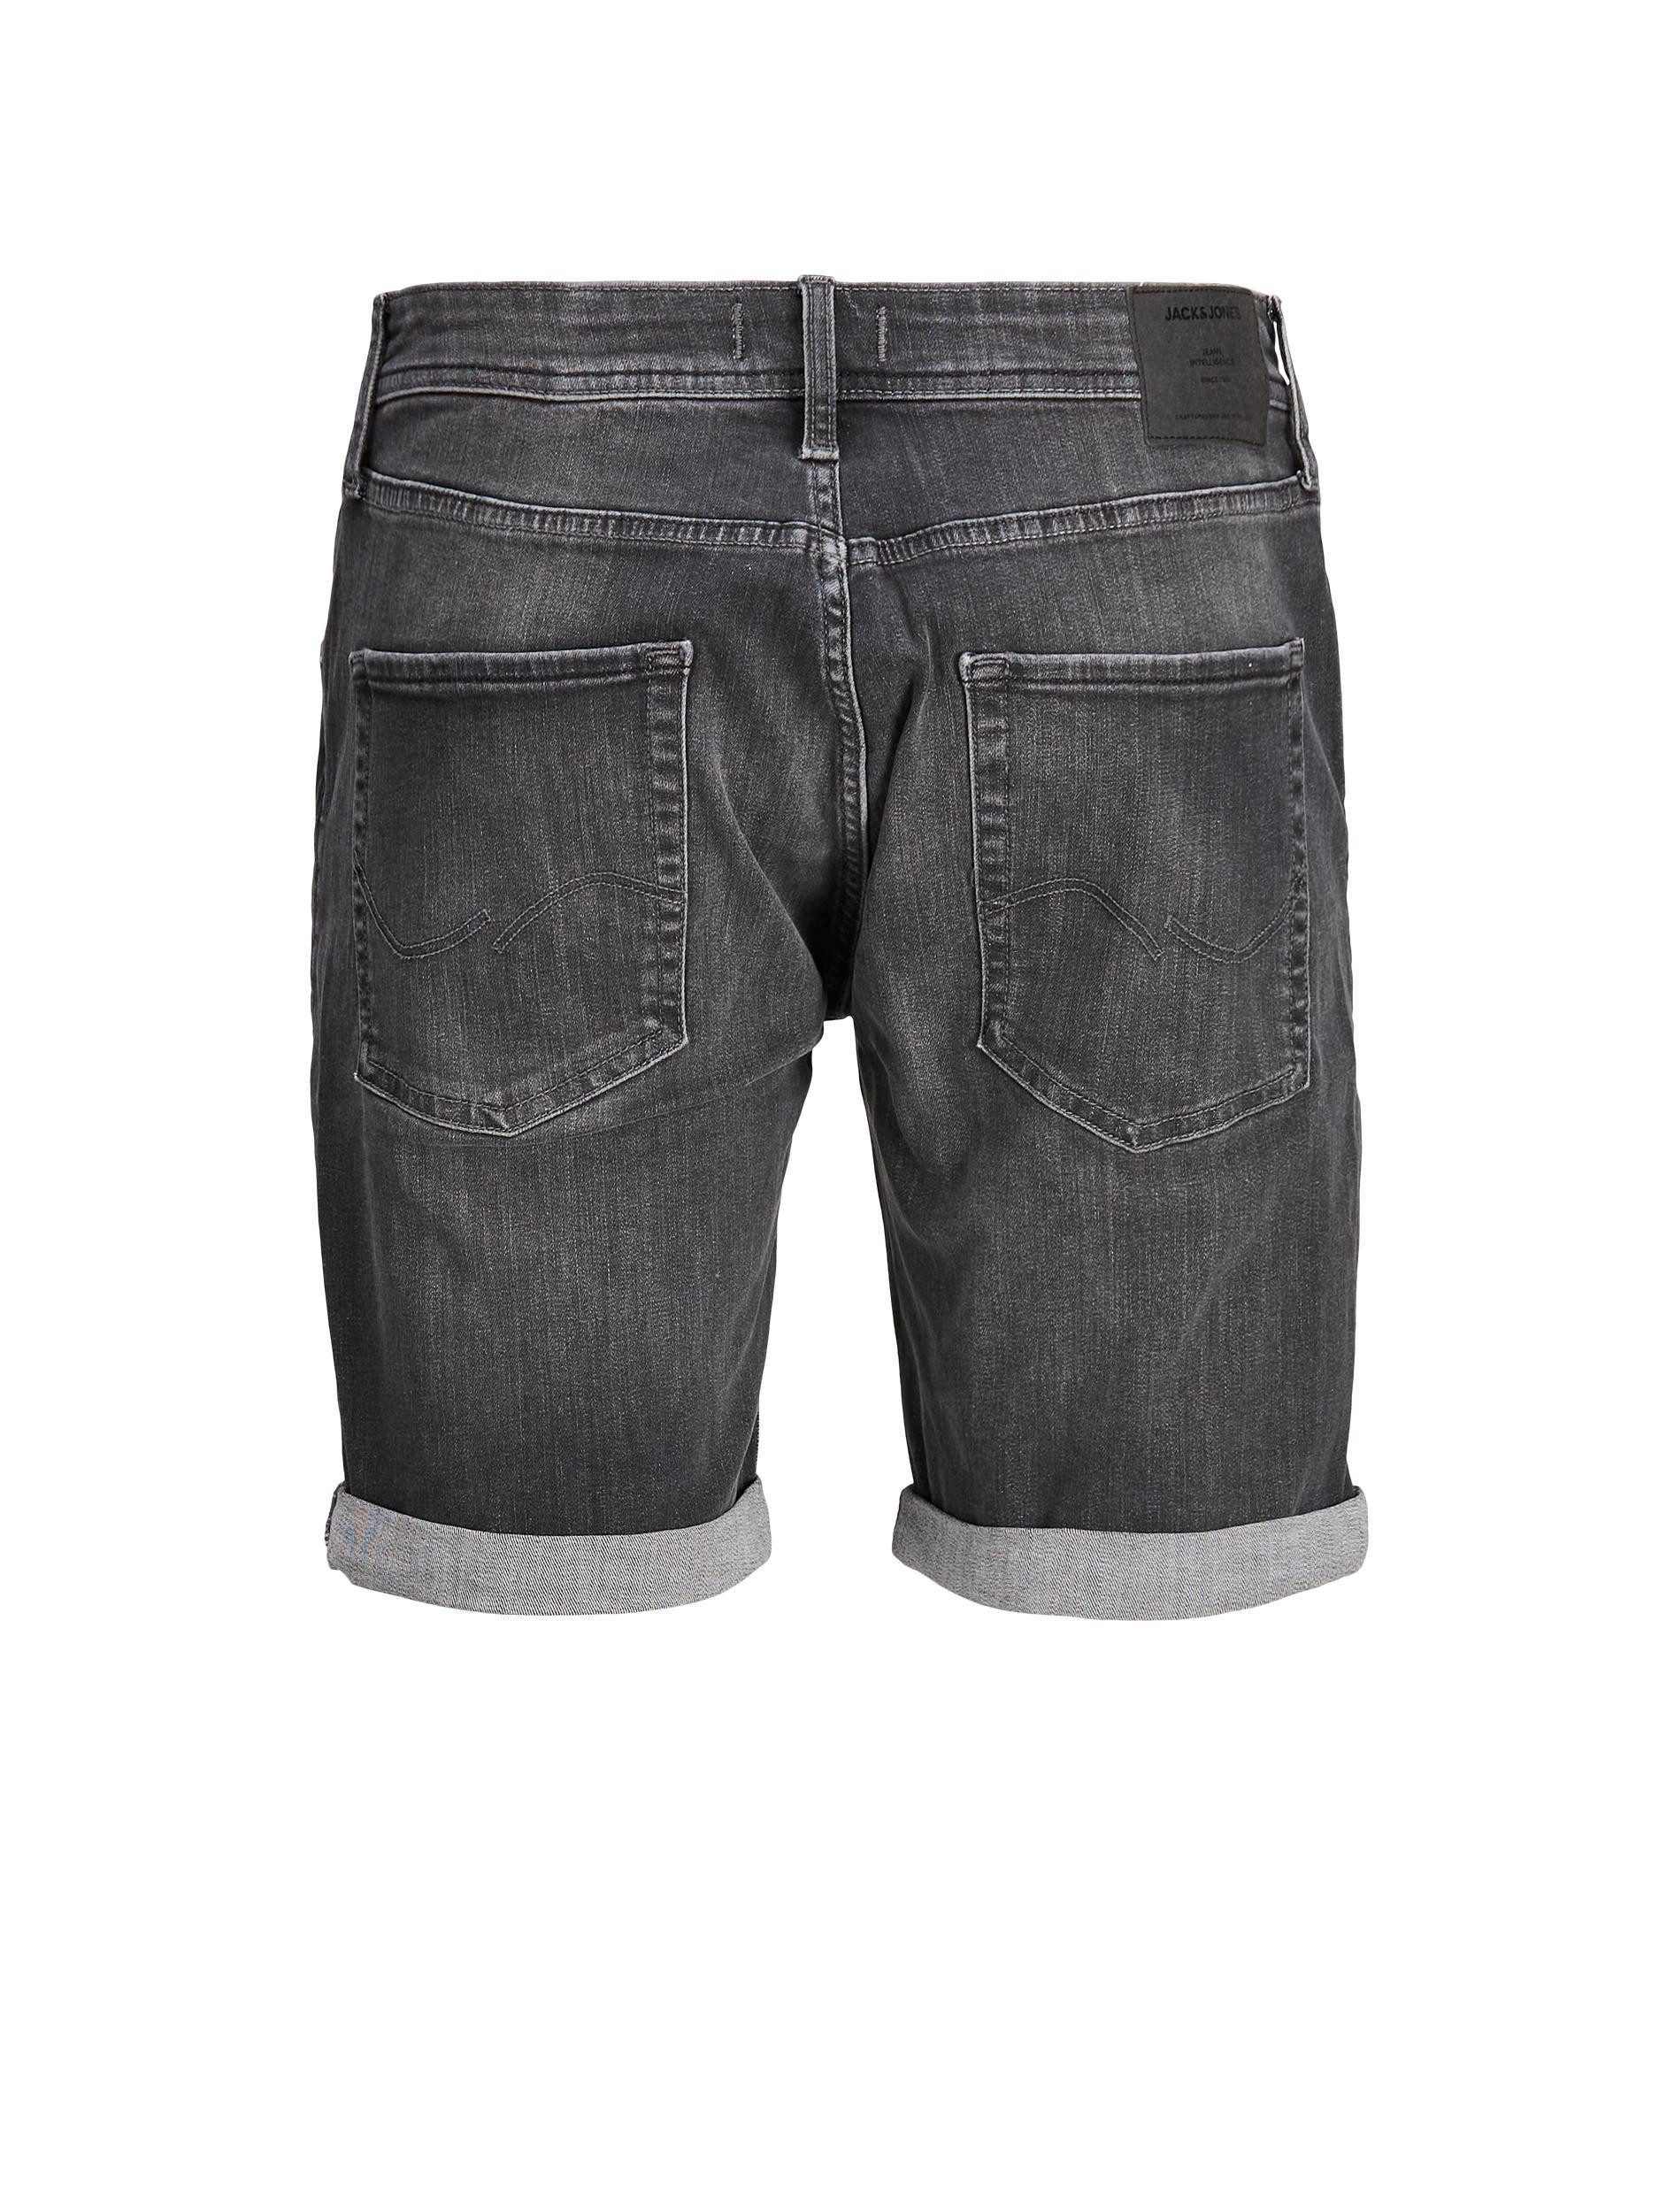 JJIRICK JJORIGINAL SHORTS AGI 200 JACK&JONES   Shorts   12187577BLACK DENIM